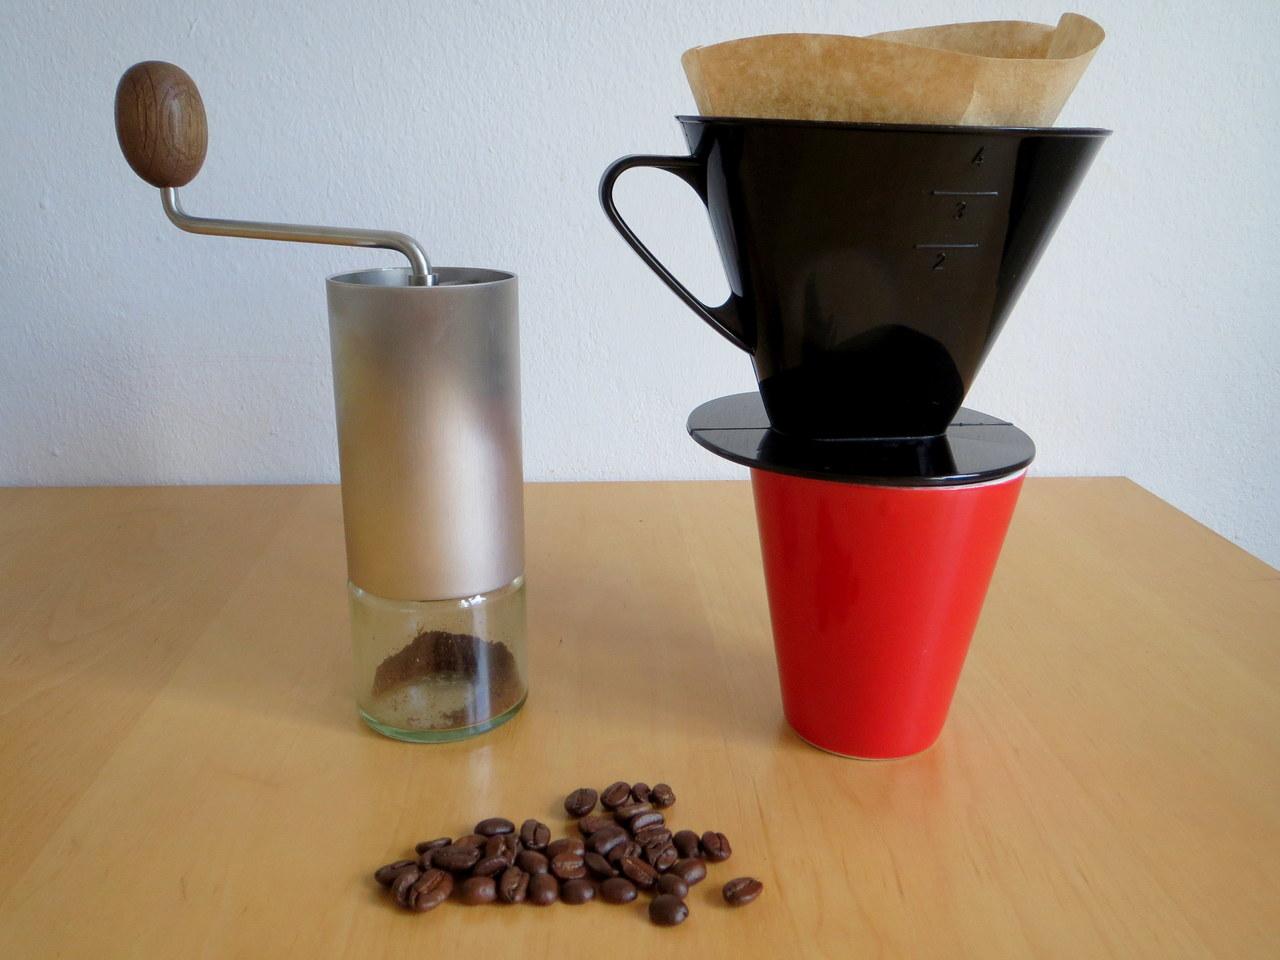 filterkaffee anleitung und tipps f r richtig guten kaffee. Black Bedroom Furniture Sets. Home Design Ideas